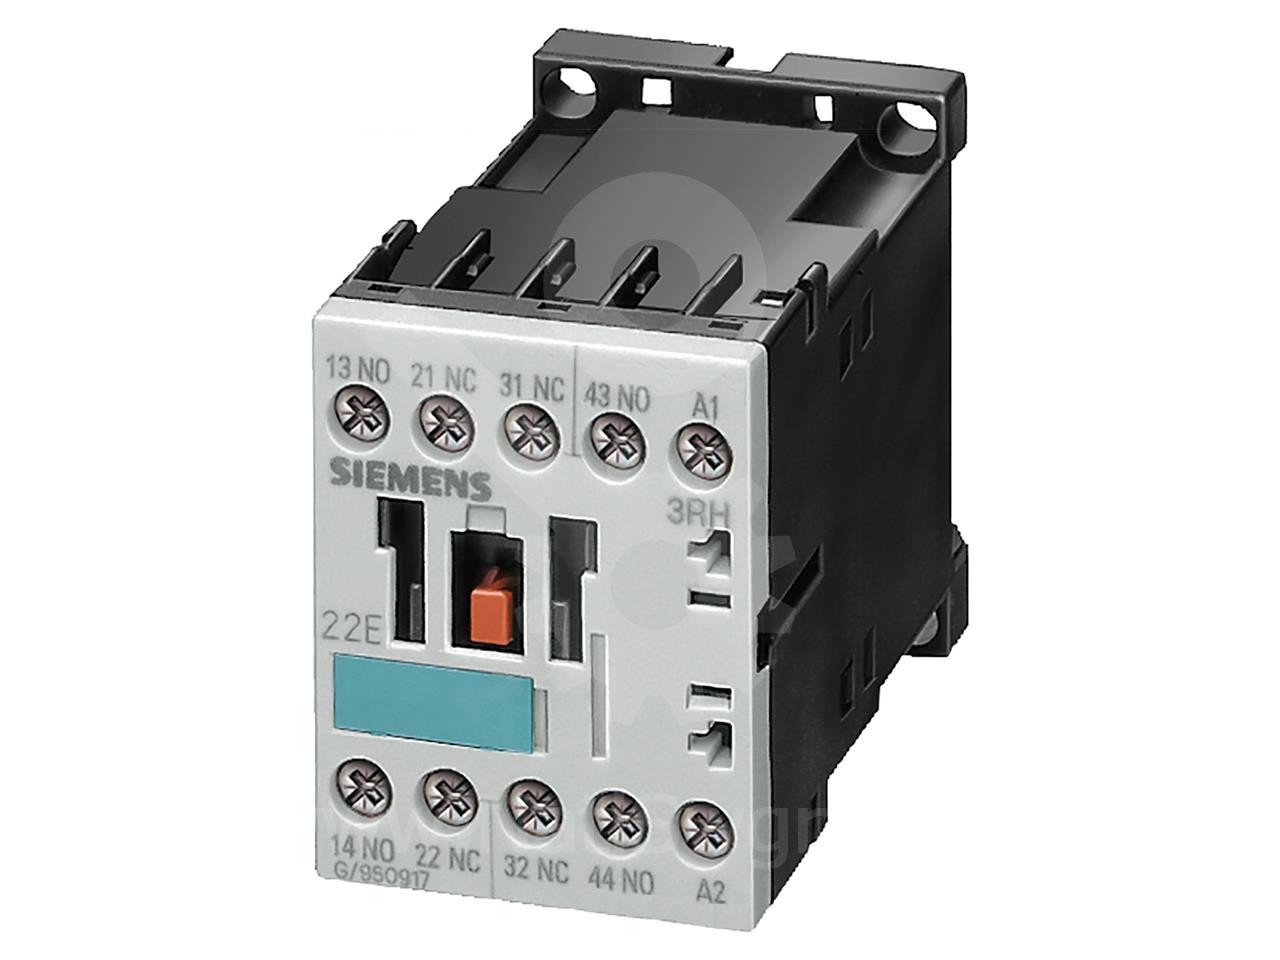 Siemens / Allis Chalmers SA 120VAC CONTACTOR RELAY UNUSED SURPLUS